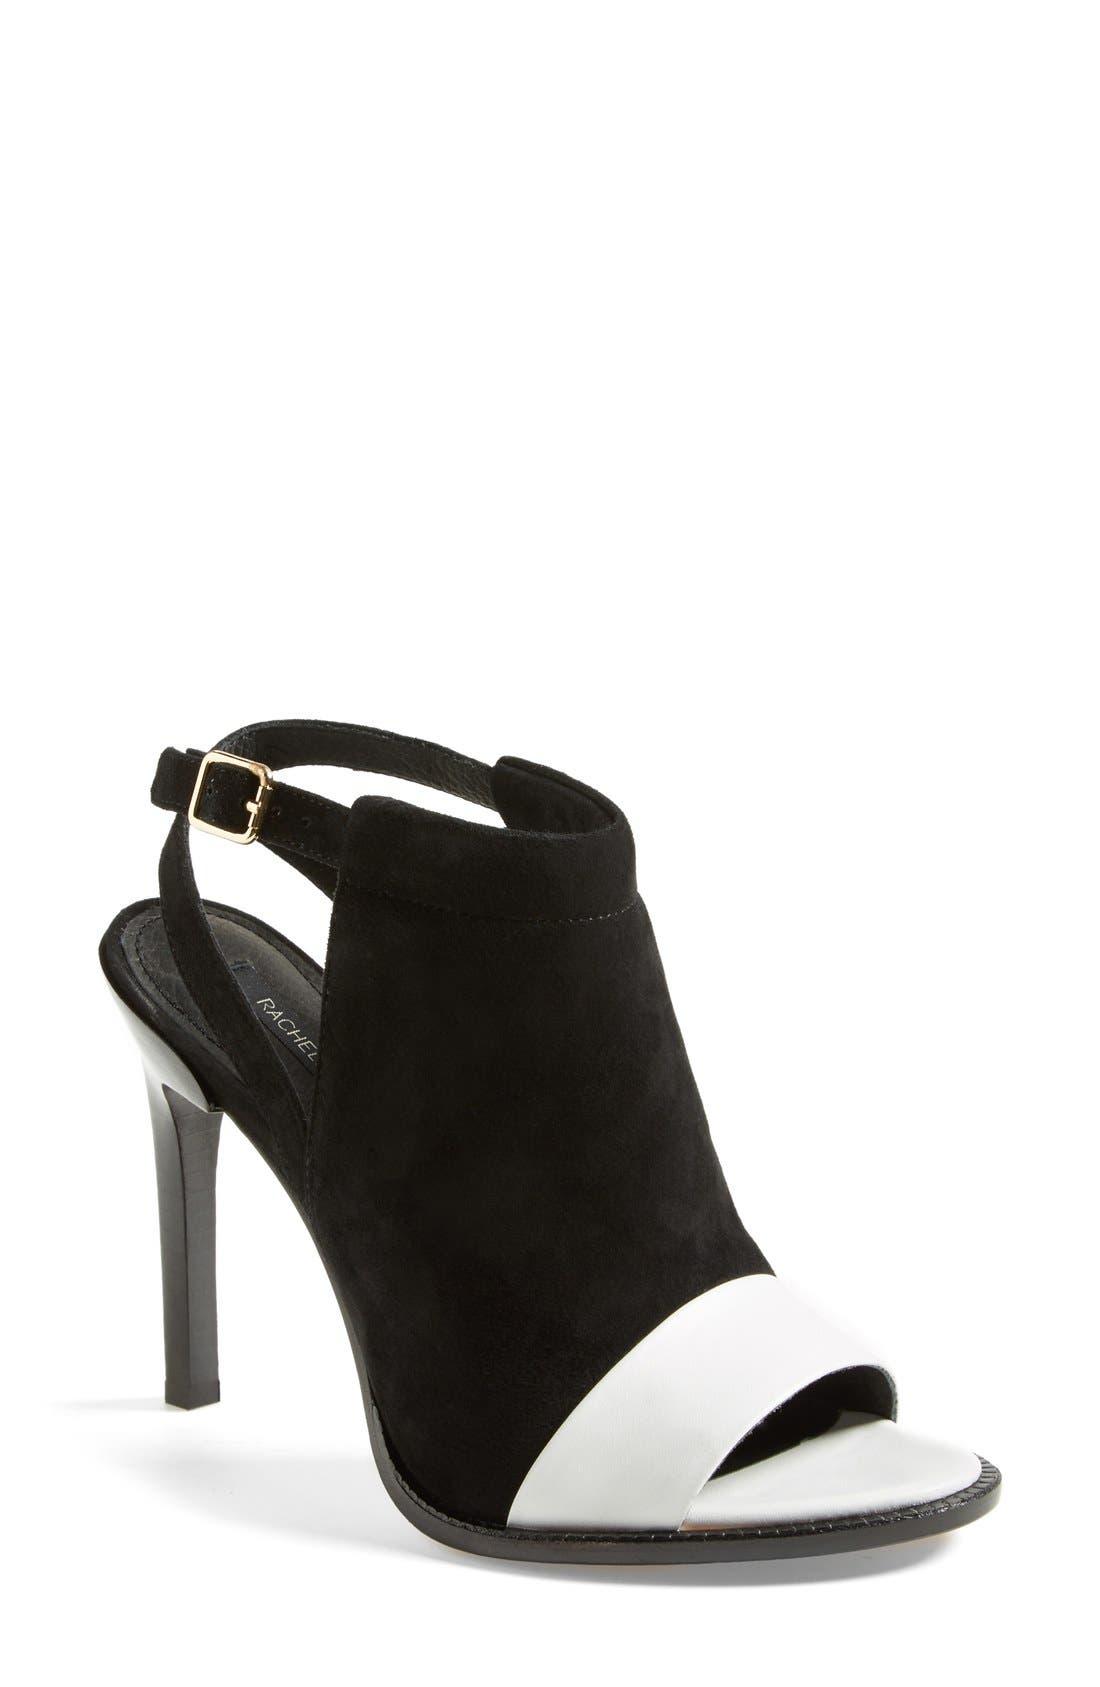 Main Image - Rachel Zoe 'Lacey' Sandal (Women)